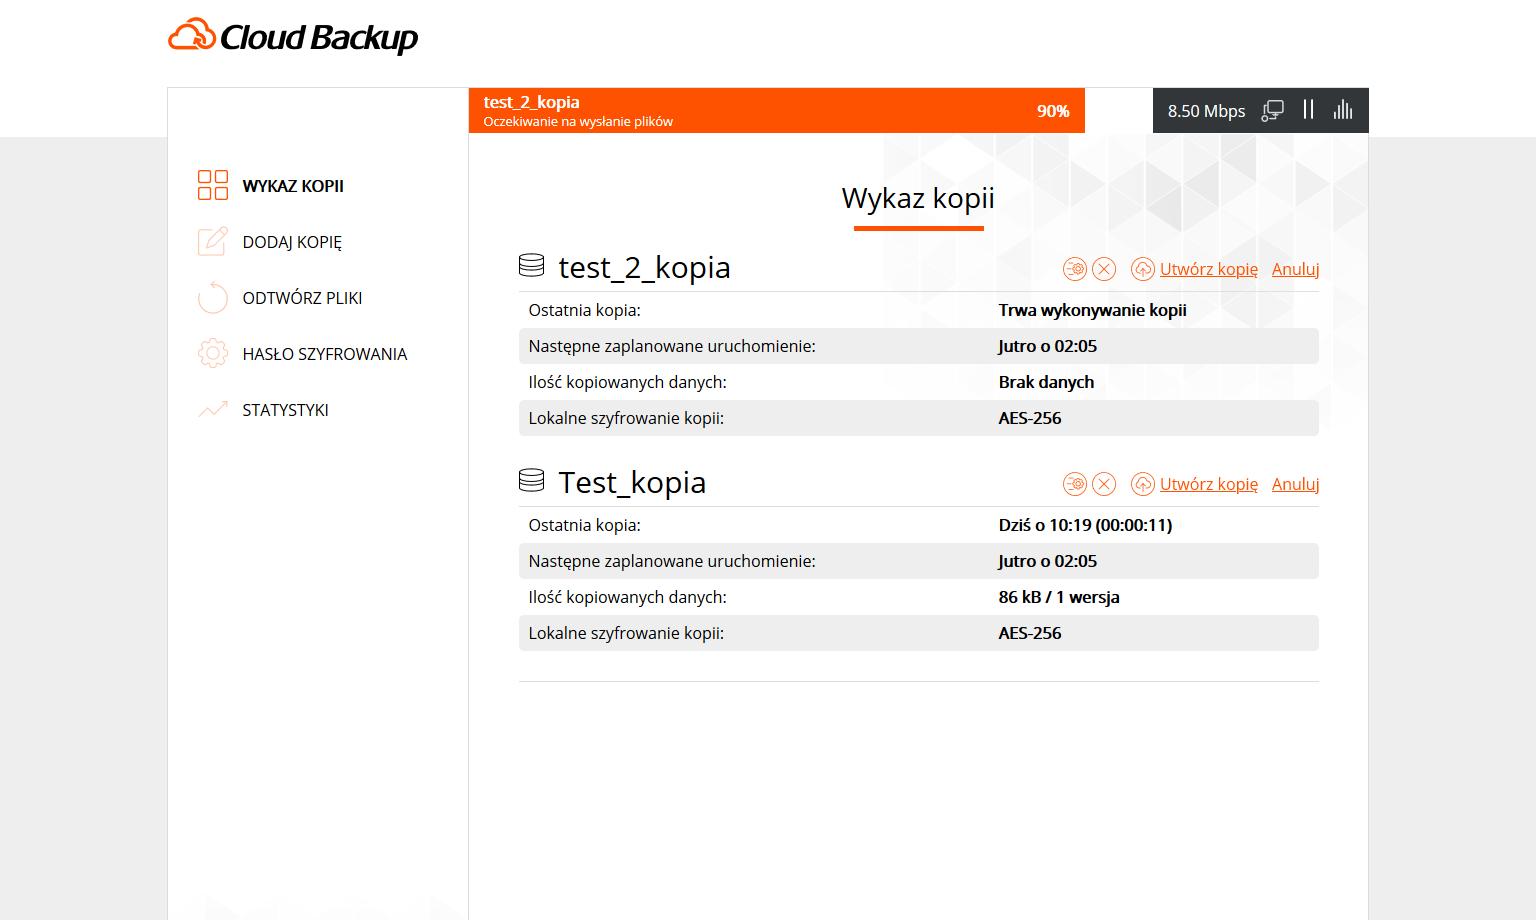 Podgląd aplikacji Cloud Backup odnazwa.pl